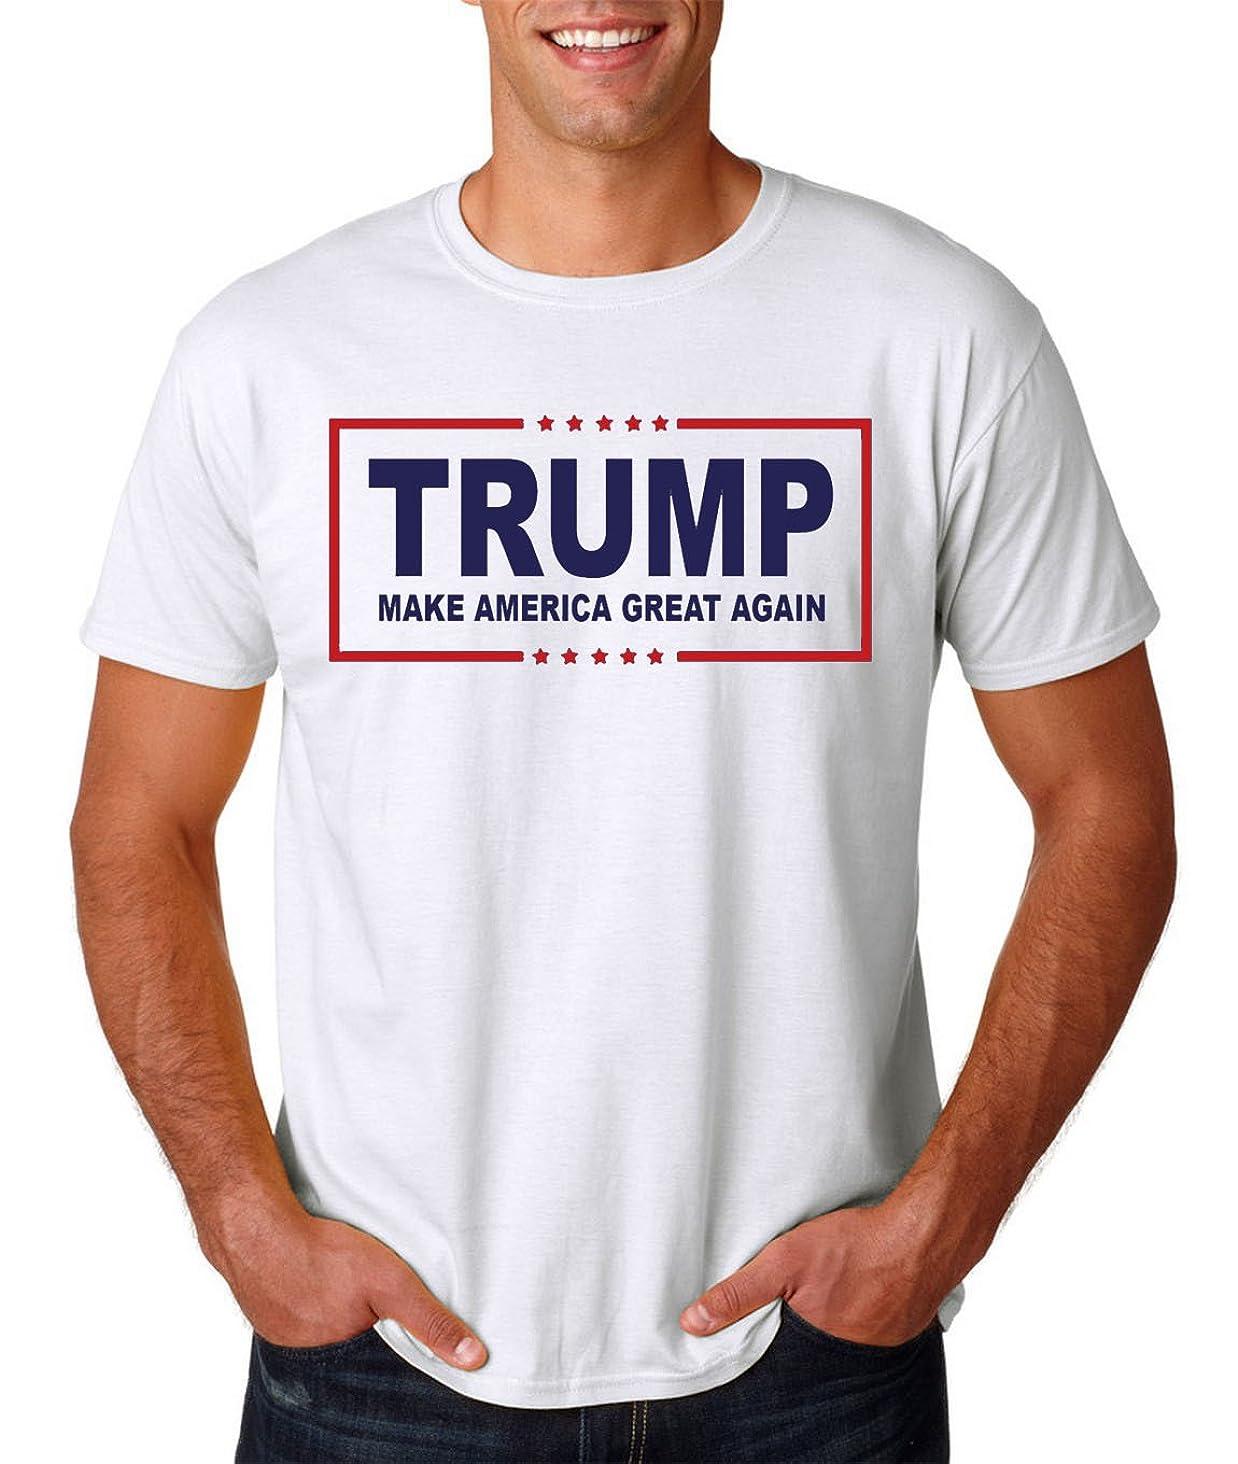 AW Fashions Men's Trump Make America Great Again - MAGA Tee - 45th President 2020 Trump -2016 Donald Trump for T-Shirt